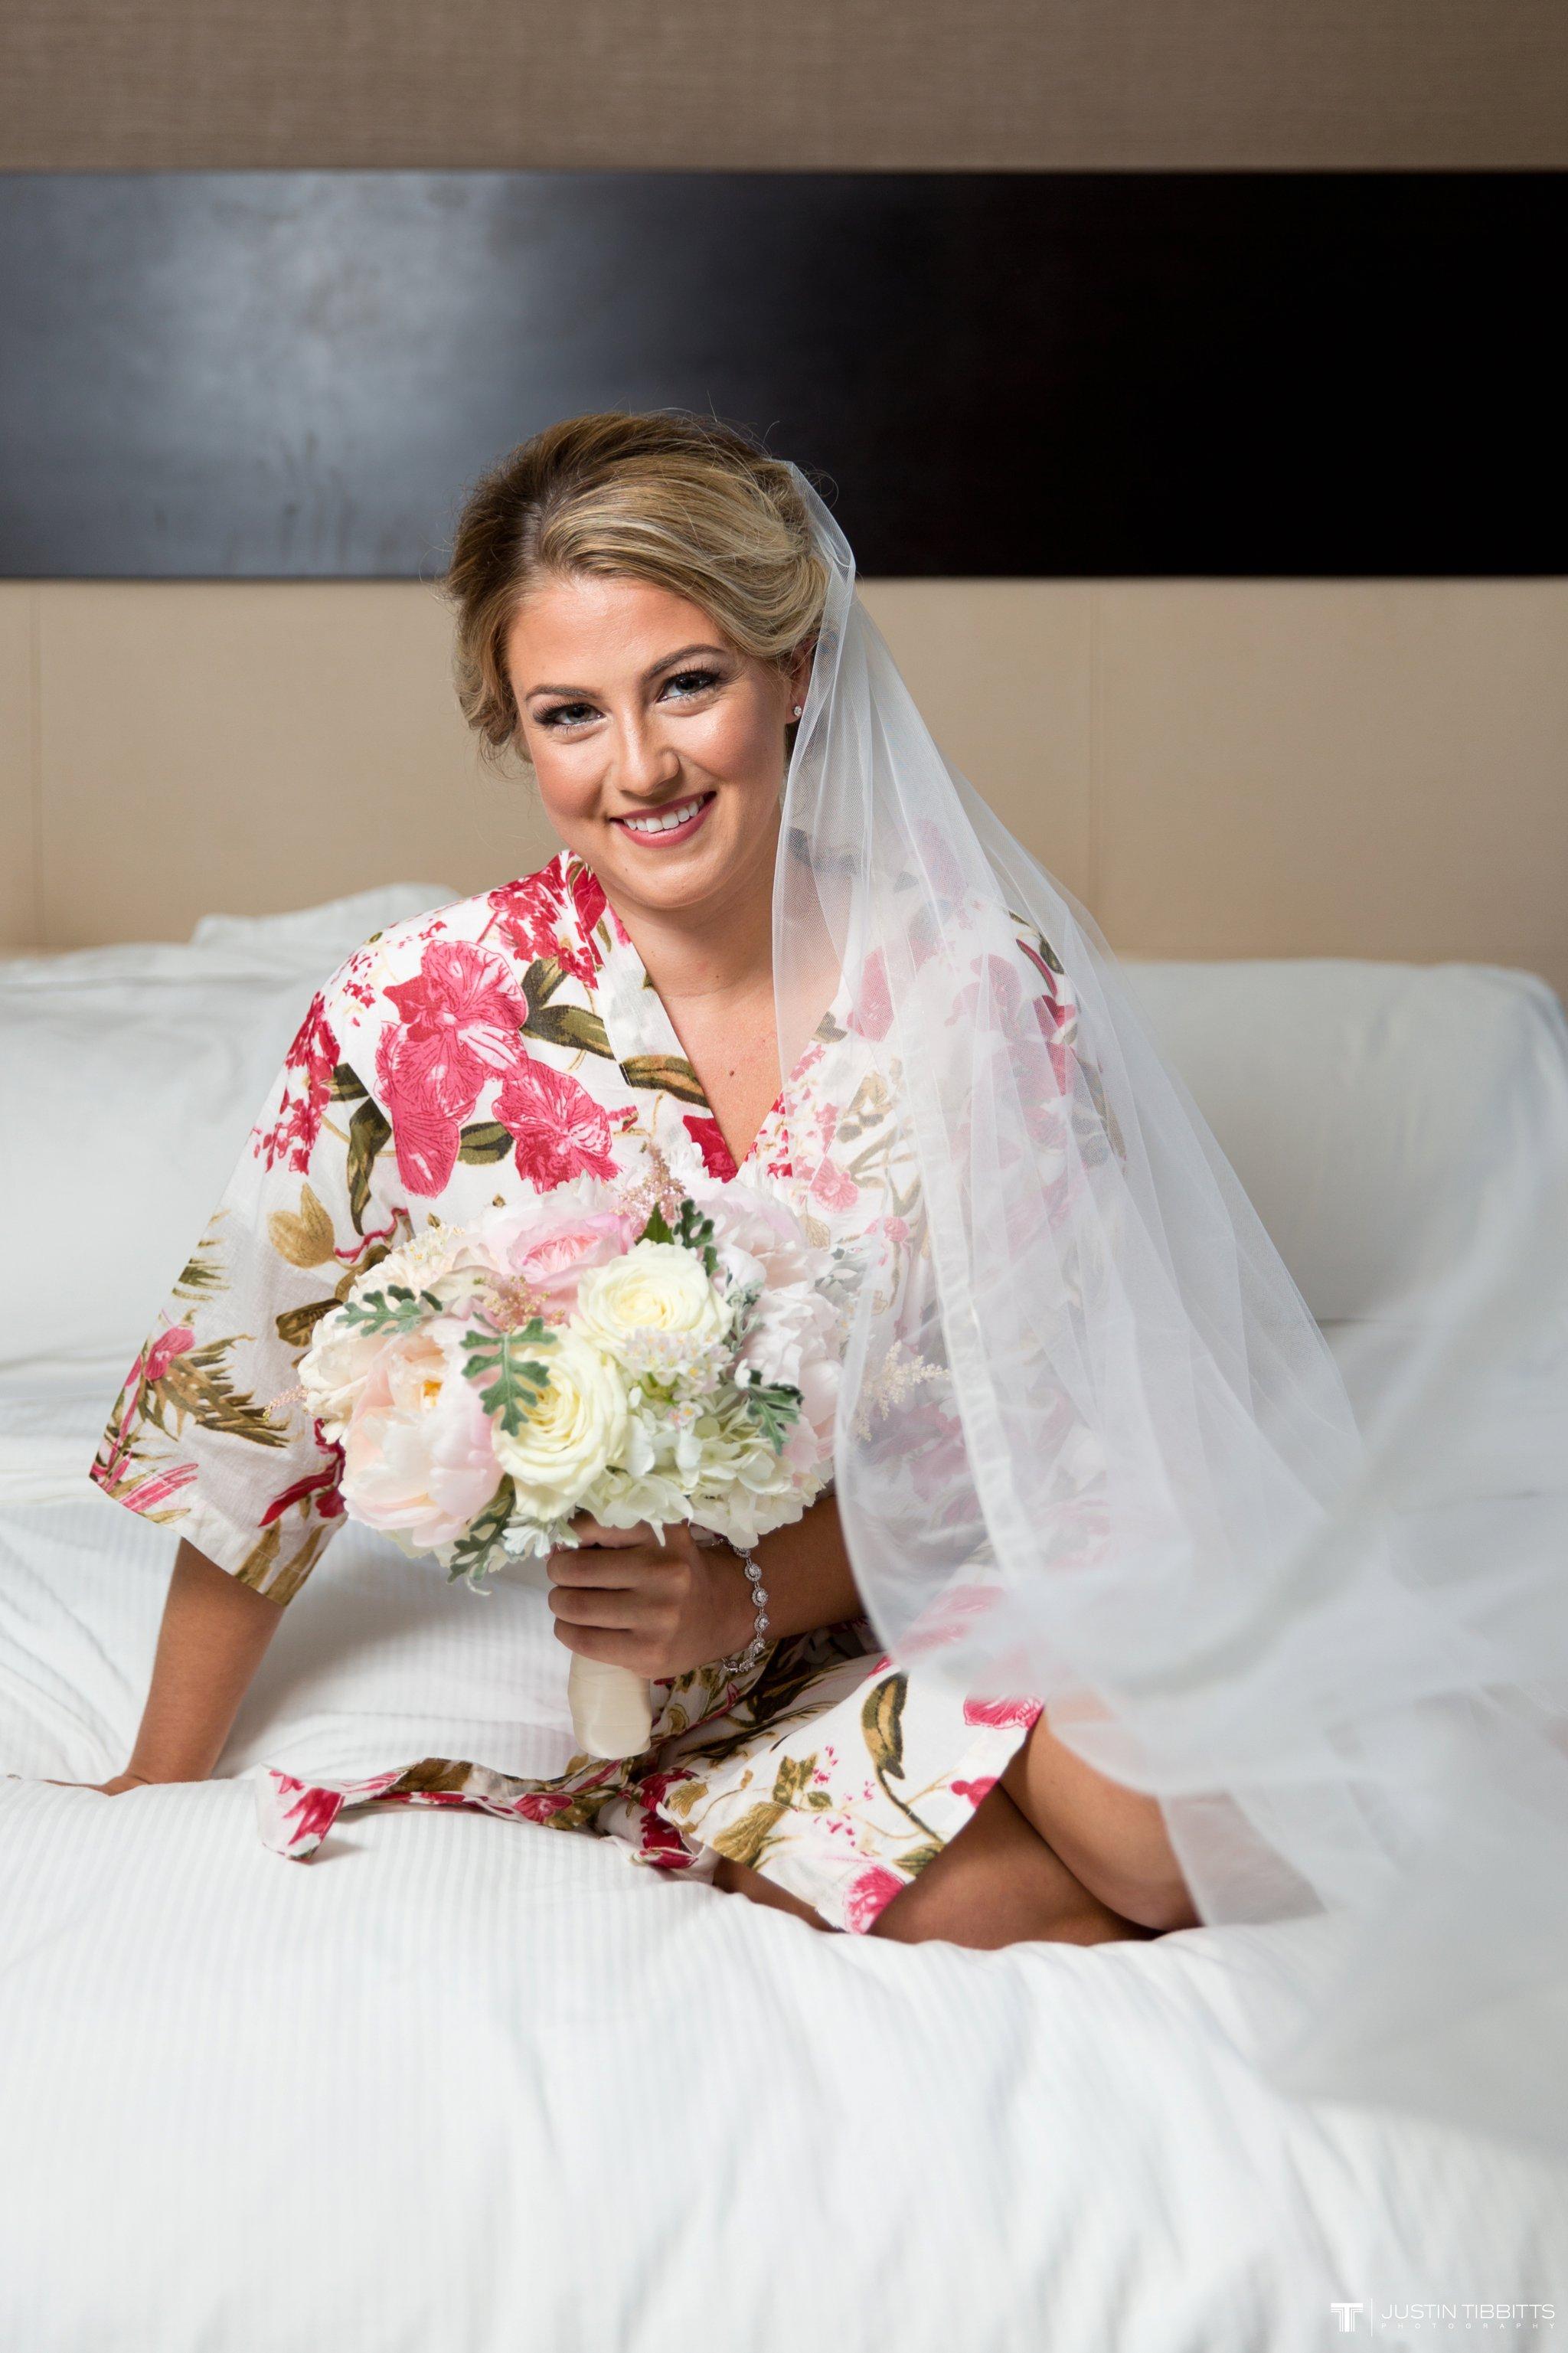 state-room-wedding-photos-with-amanda-and-nick_0027